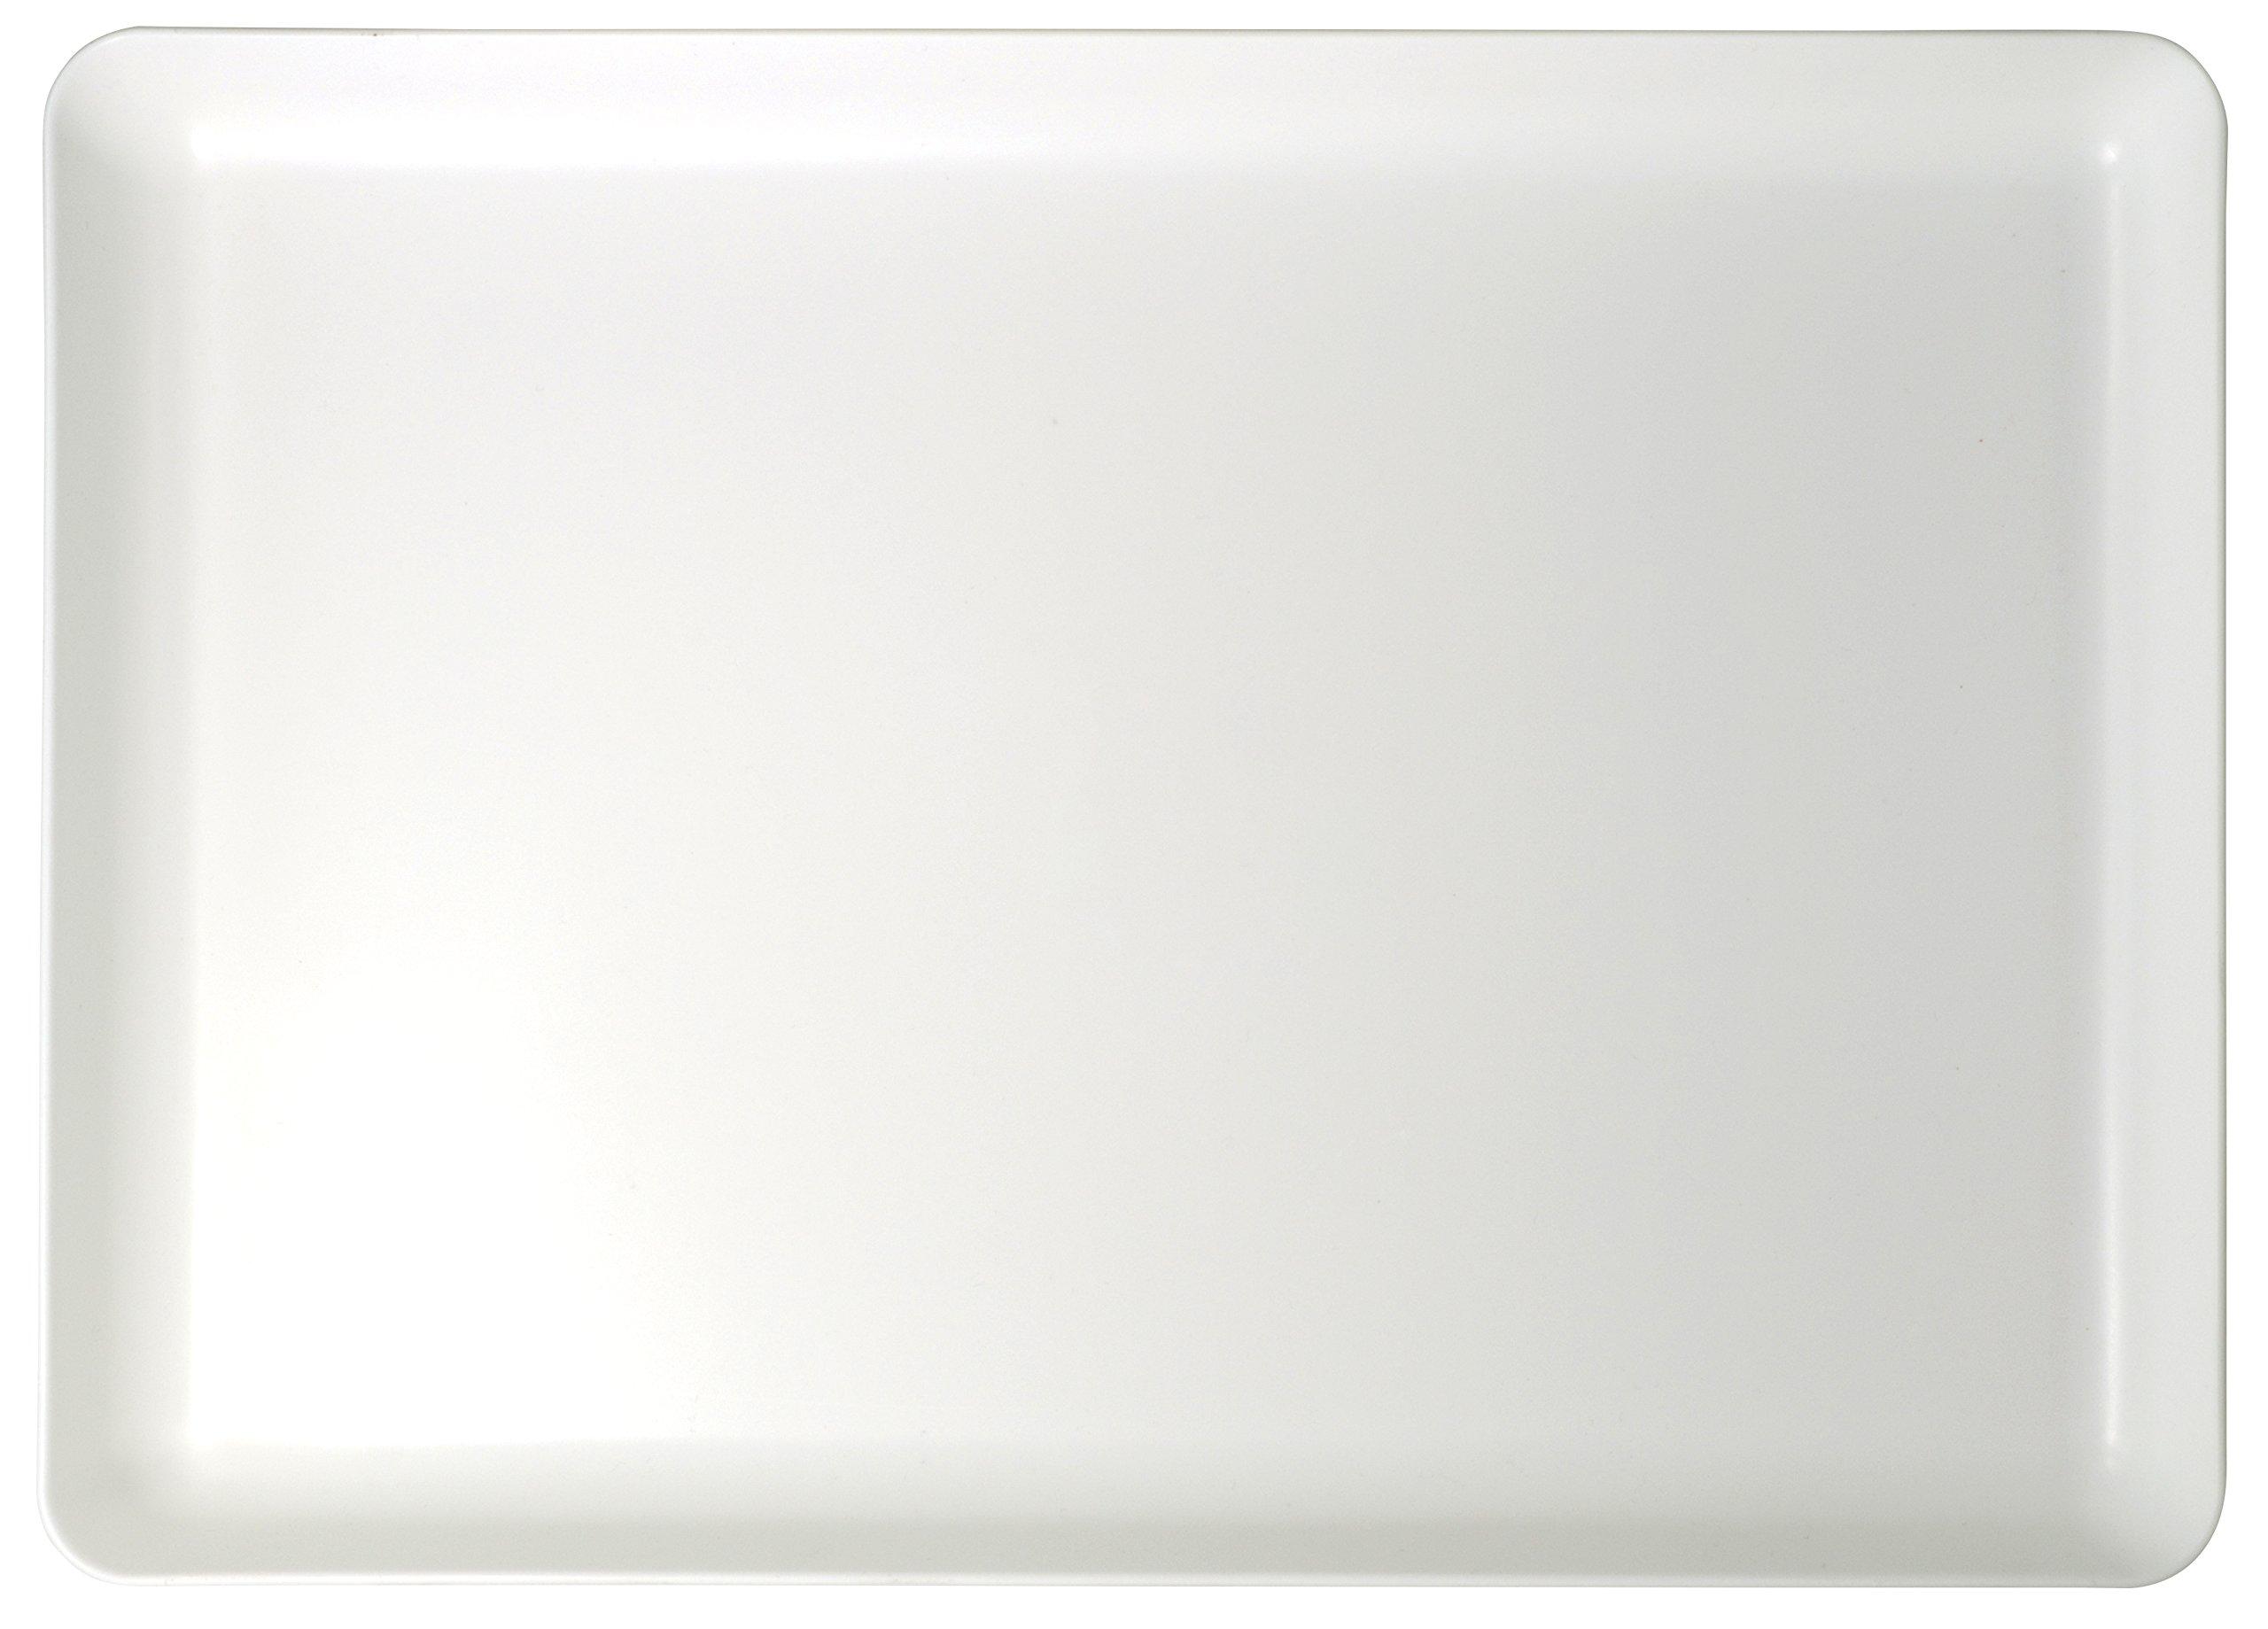 Pro Art Plastic Palette Tray, 8''-by-12 by Pro Art